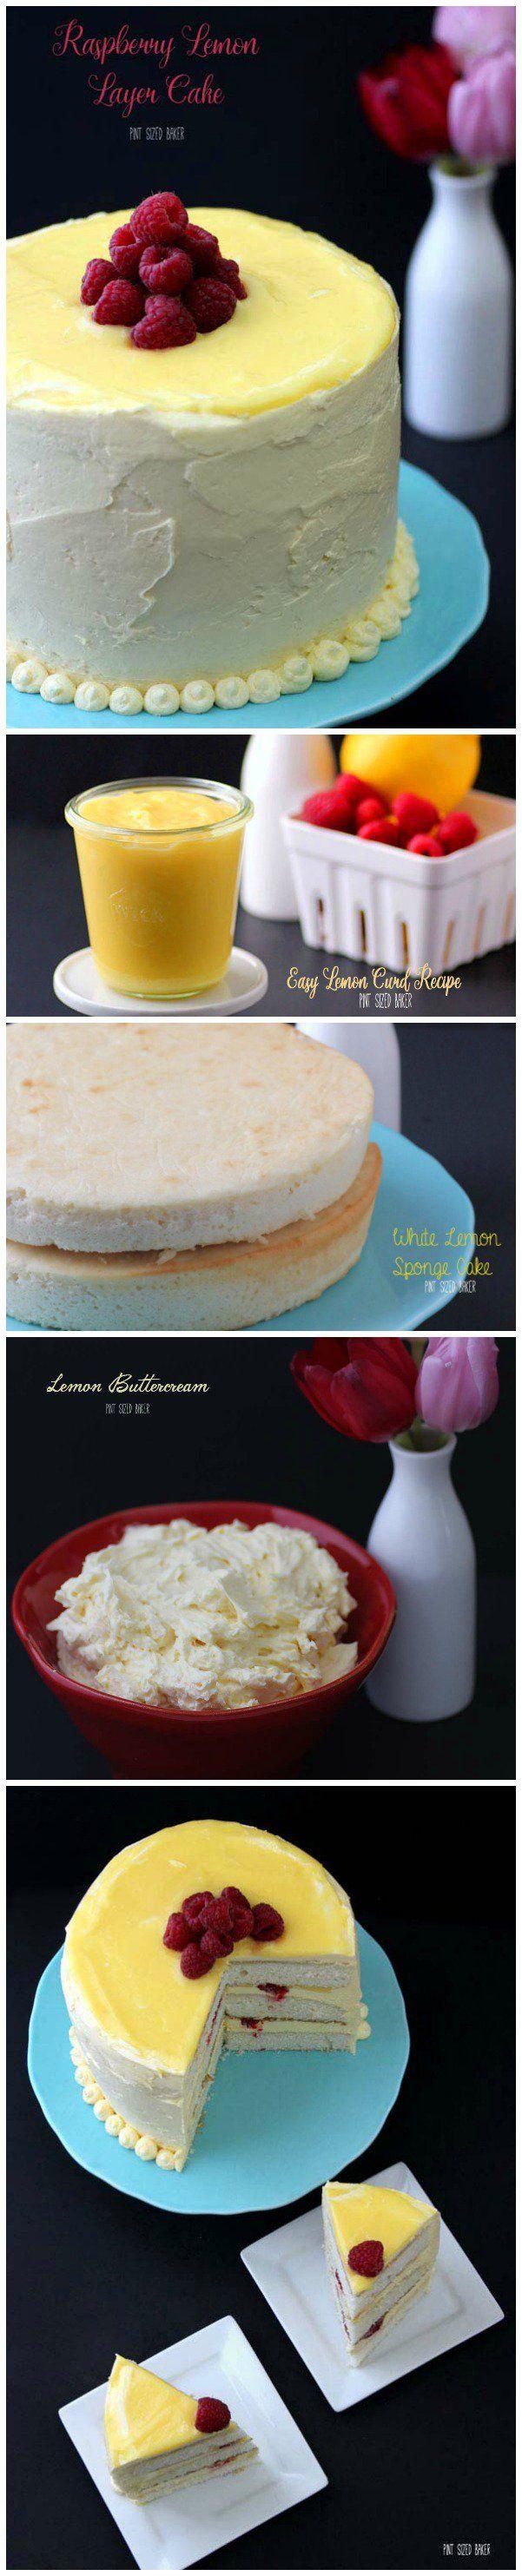 This amazing Raspberry Lemon Layer Cake is made with a white lemon sponge cake, homemade lemon curd, and sweet lemon buttercream frosting.